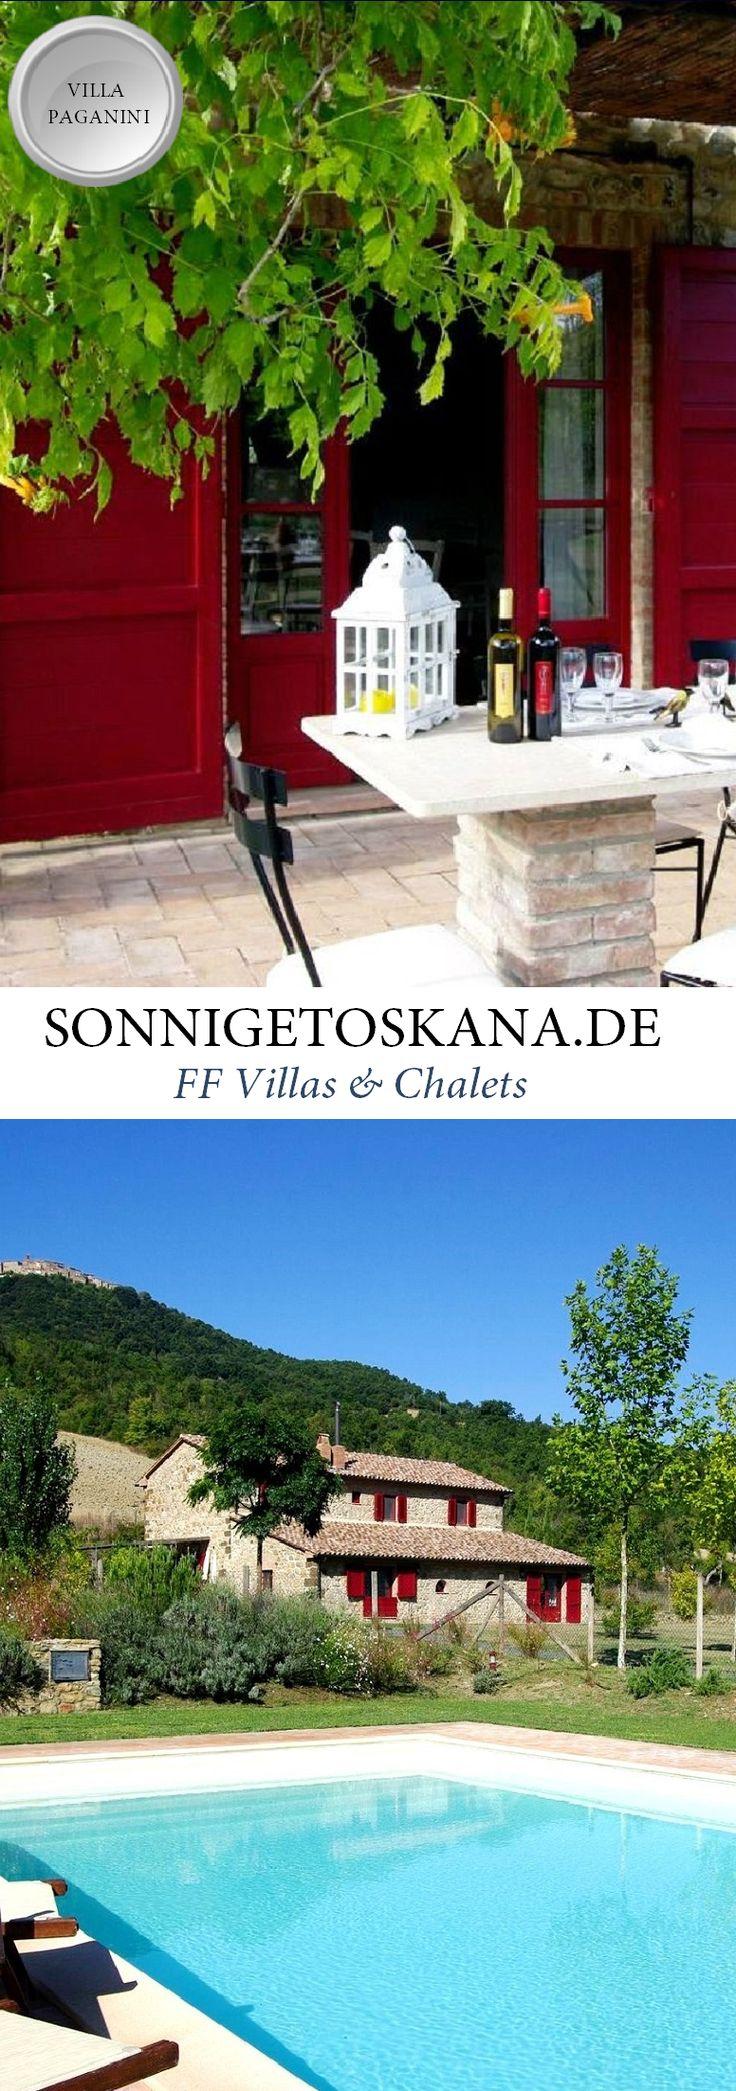 www.sonnigetoskana.de || VIlla Paganini || Italien - Toskana || Villa für 8-9…